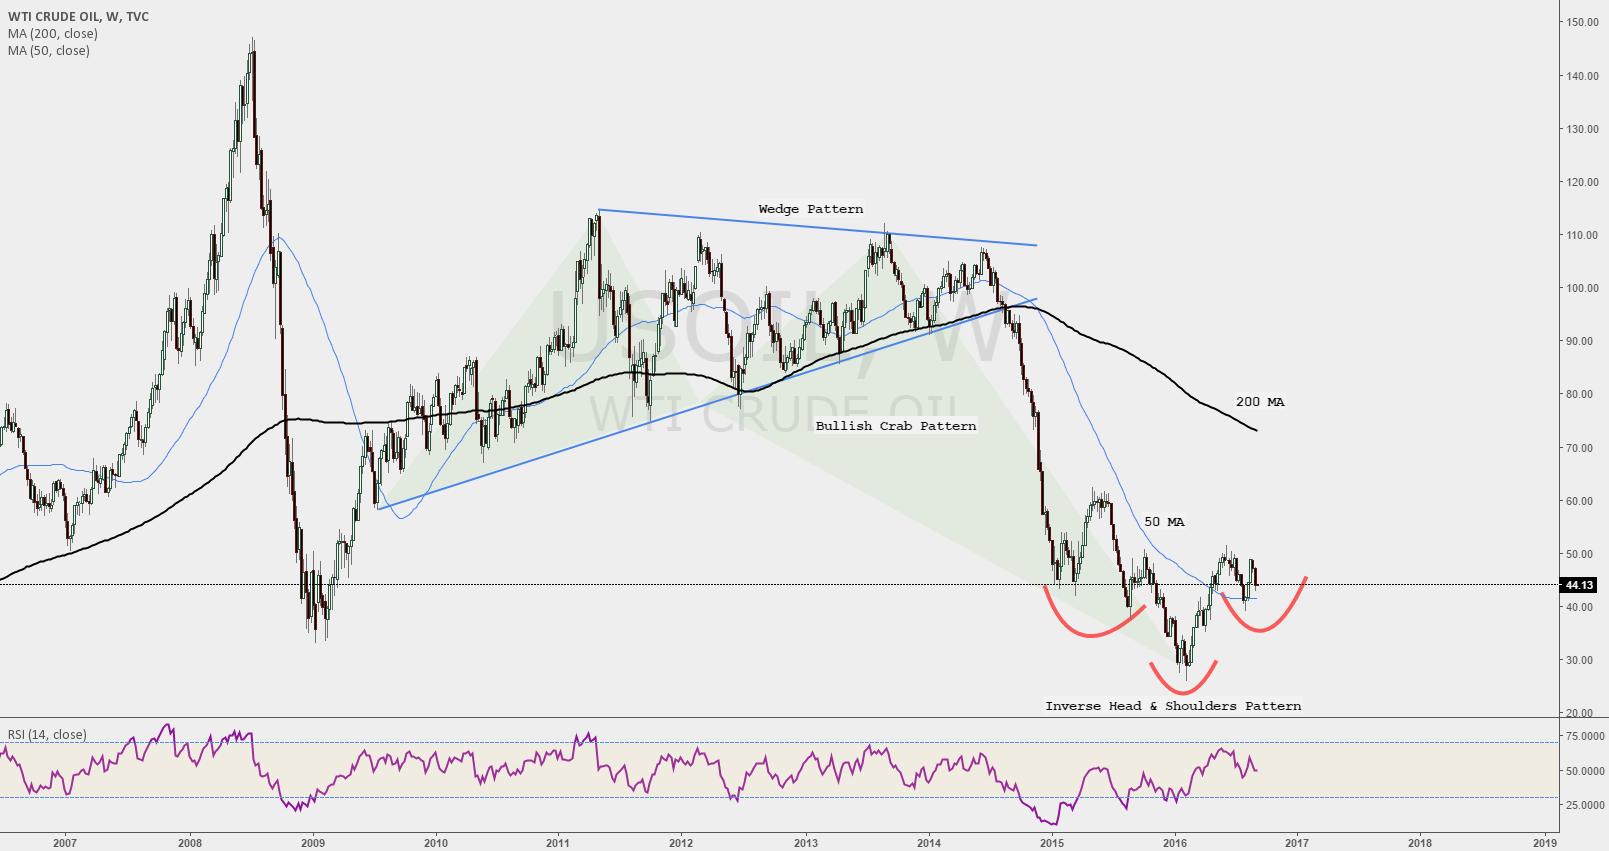 Crude: Deflation to Inflation